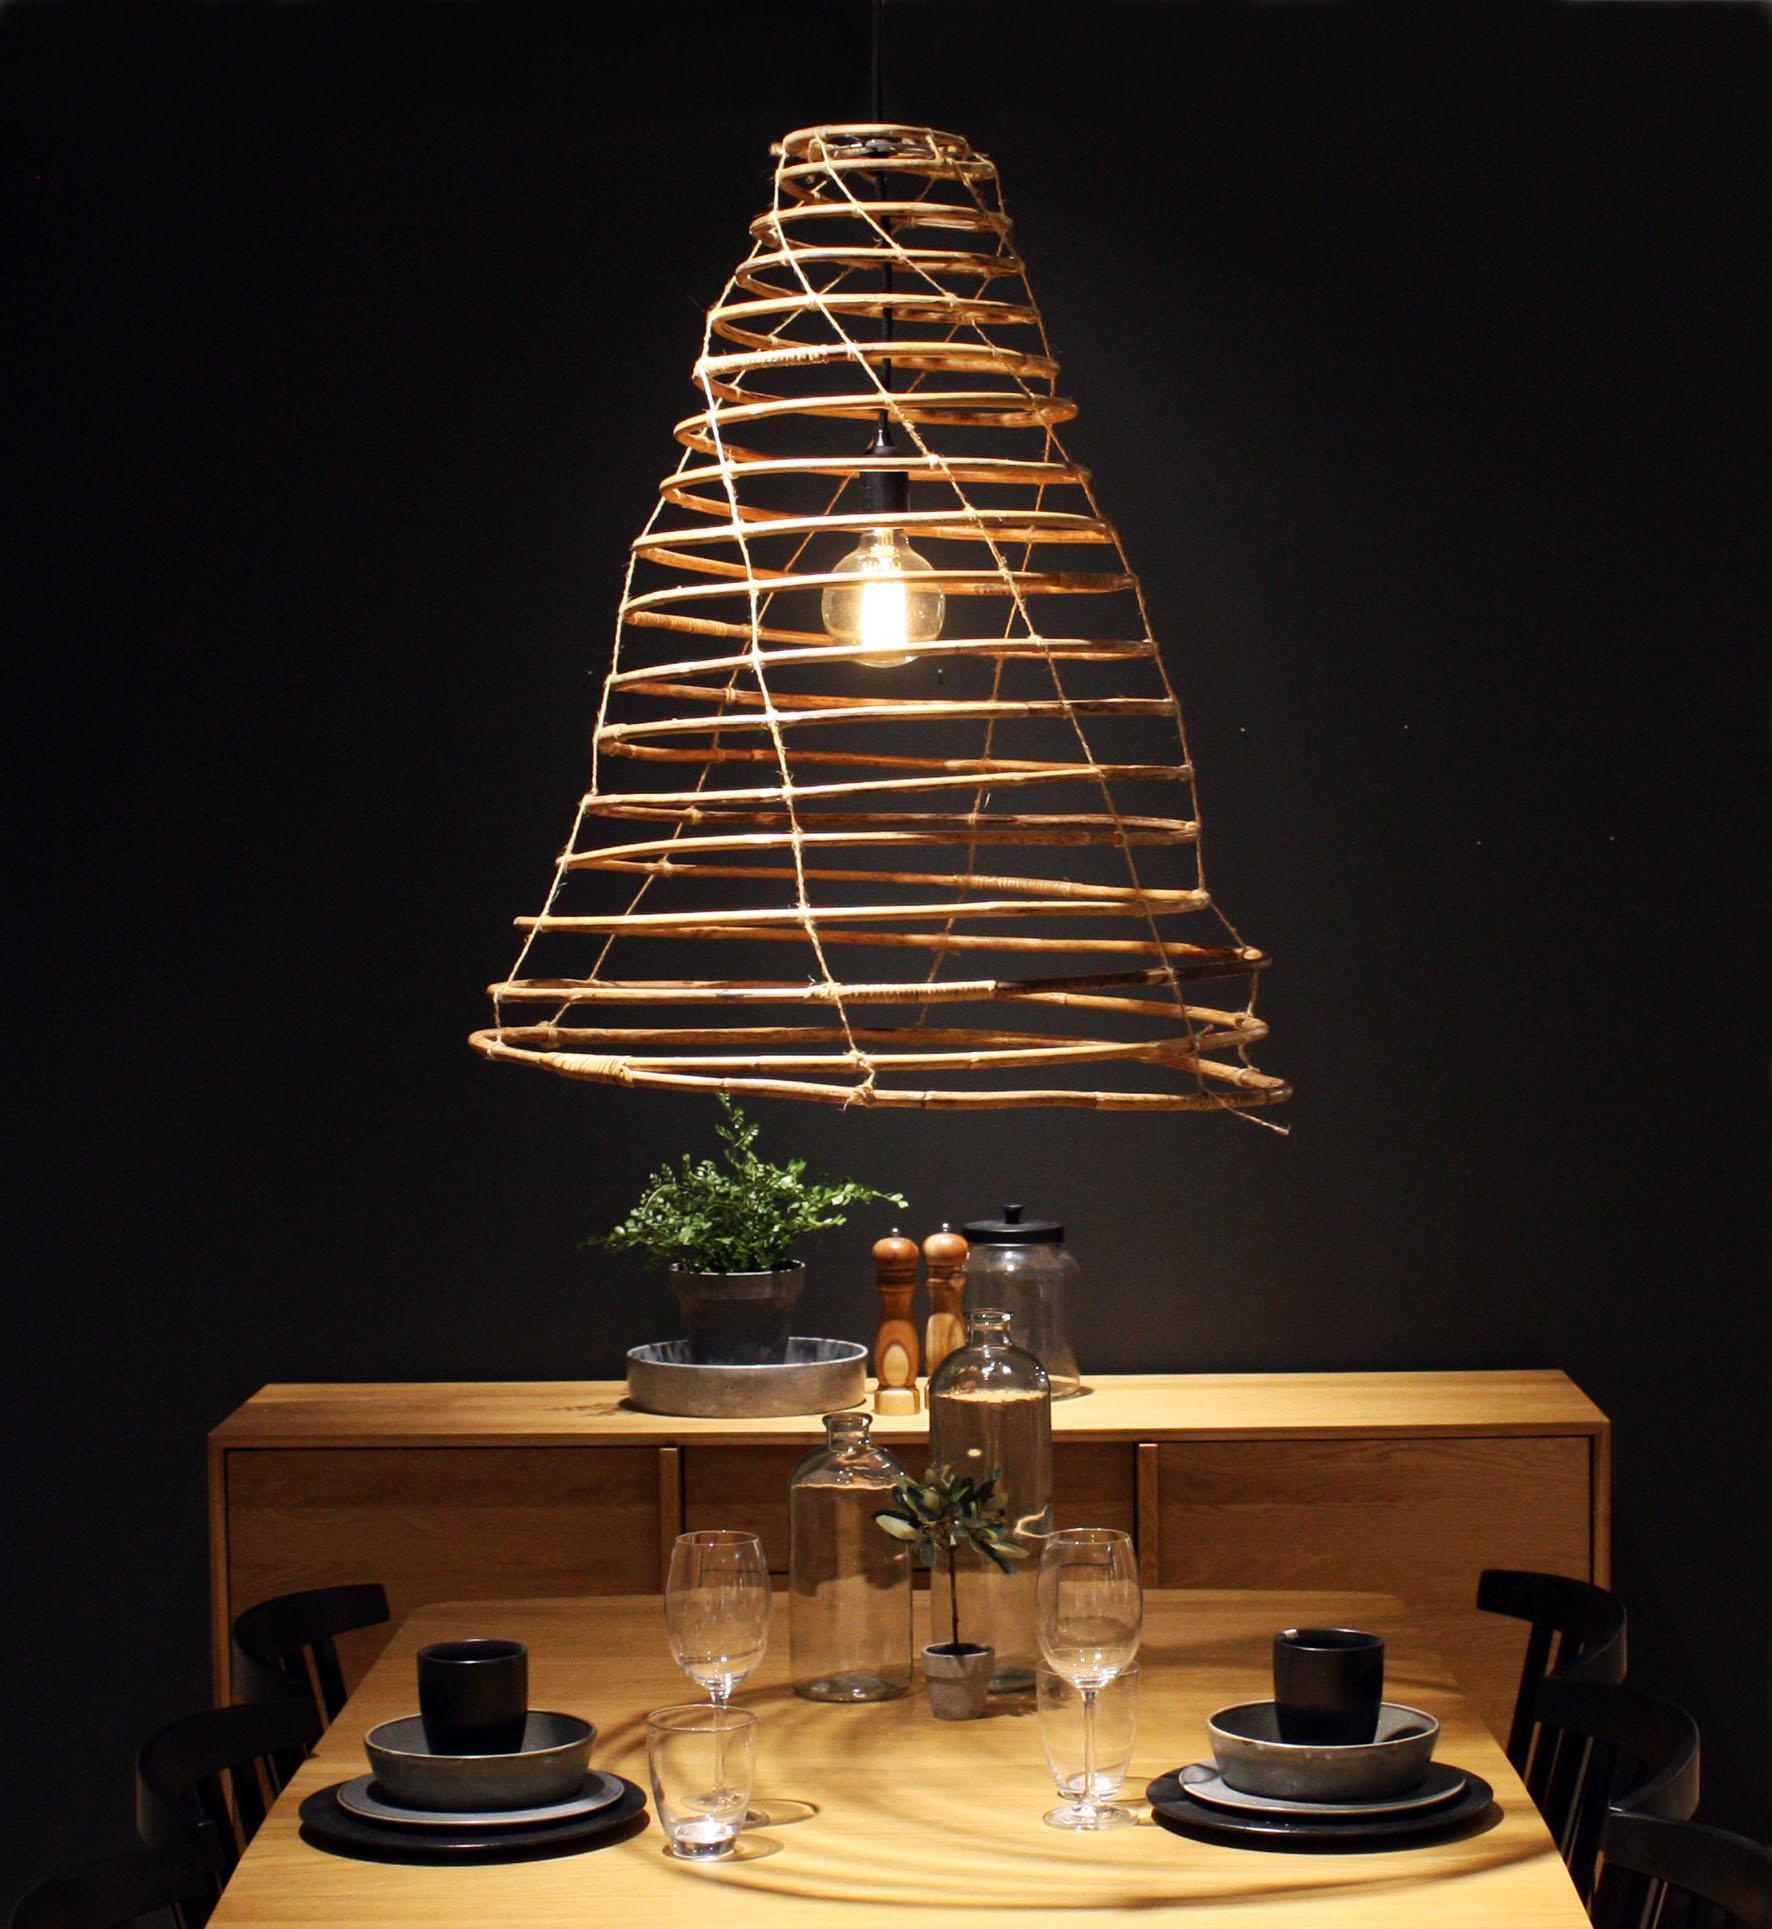 Form - a nomad design studio - Wish lamp handmade in rattan. Small